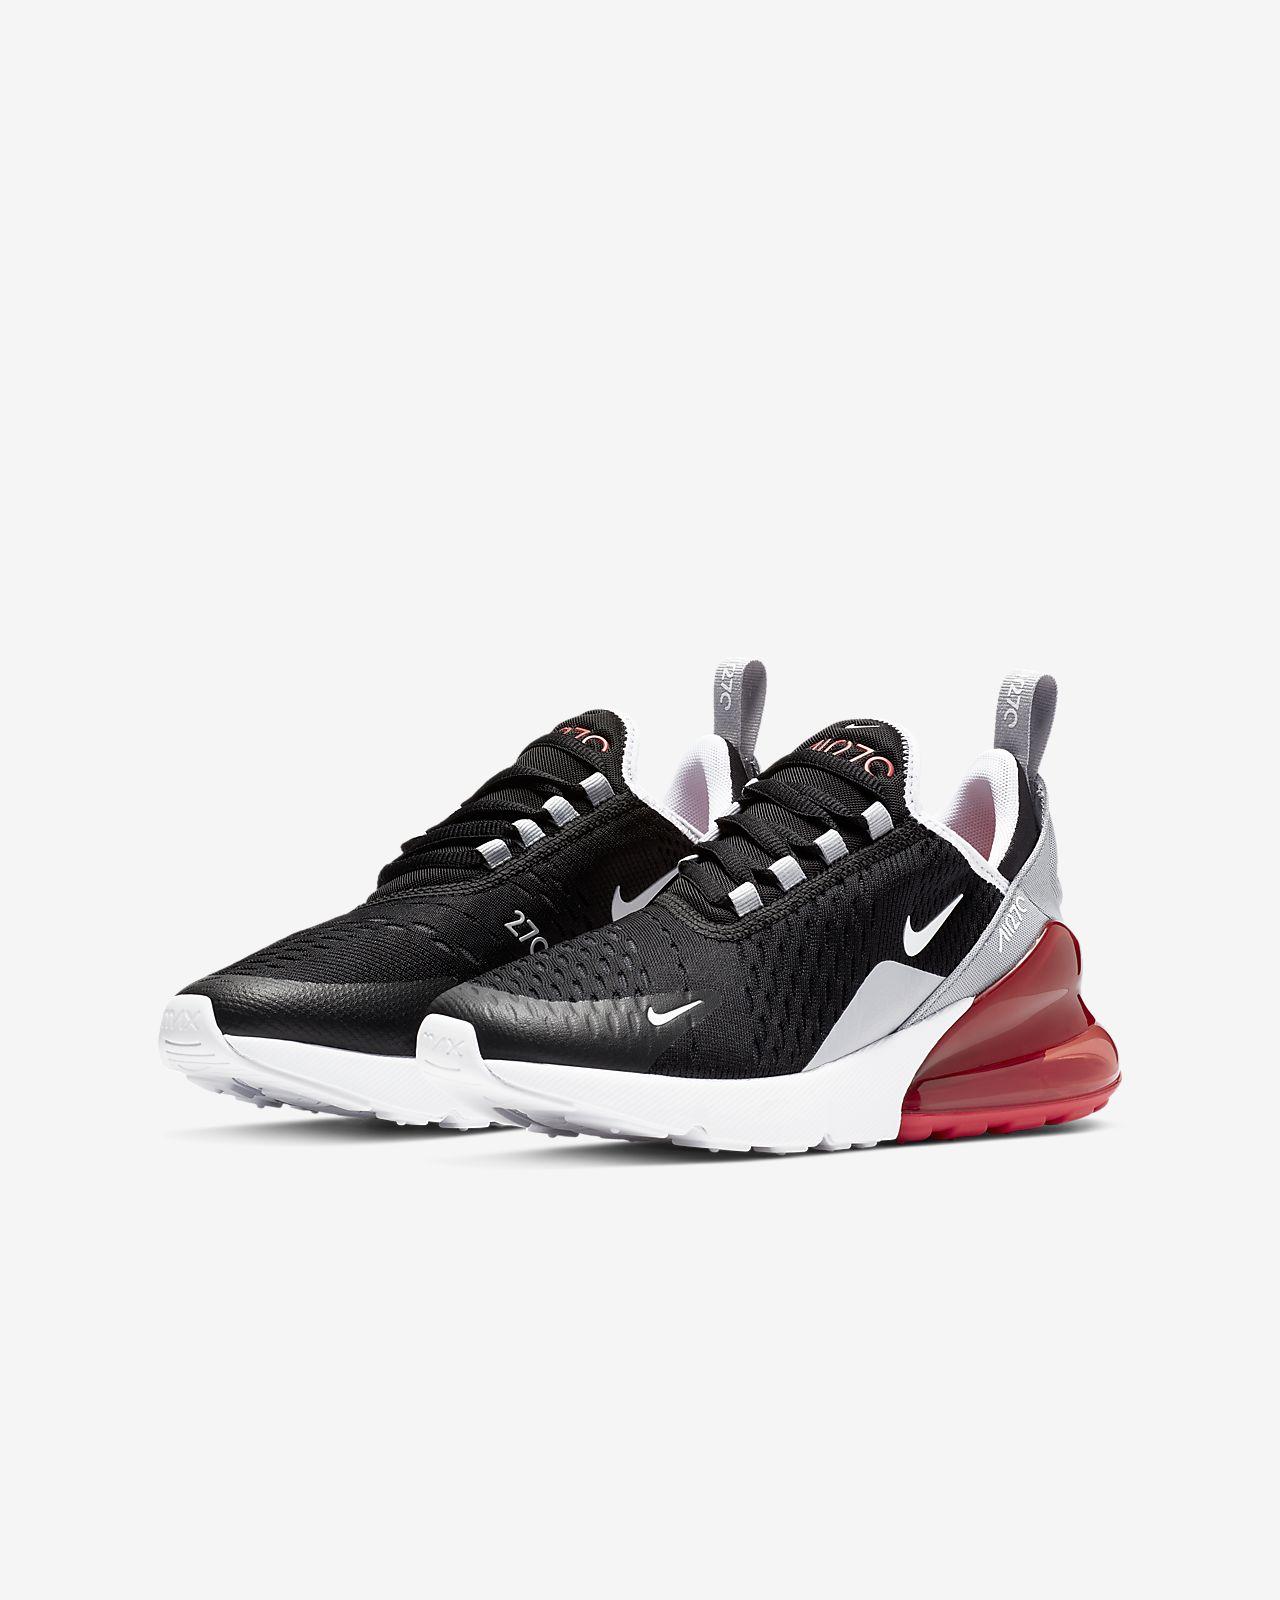 brand new 9855f b60c1 ... Nike Air Max 270 Older Kids Shoe